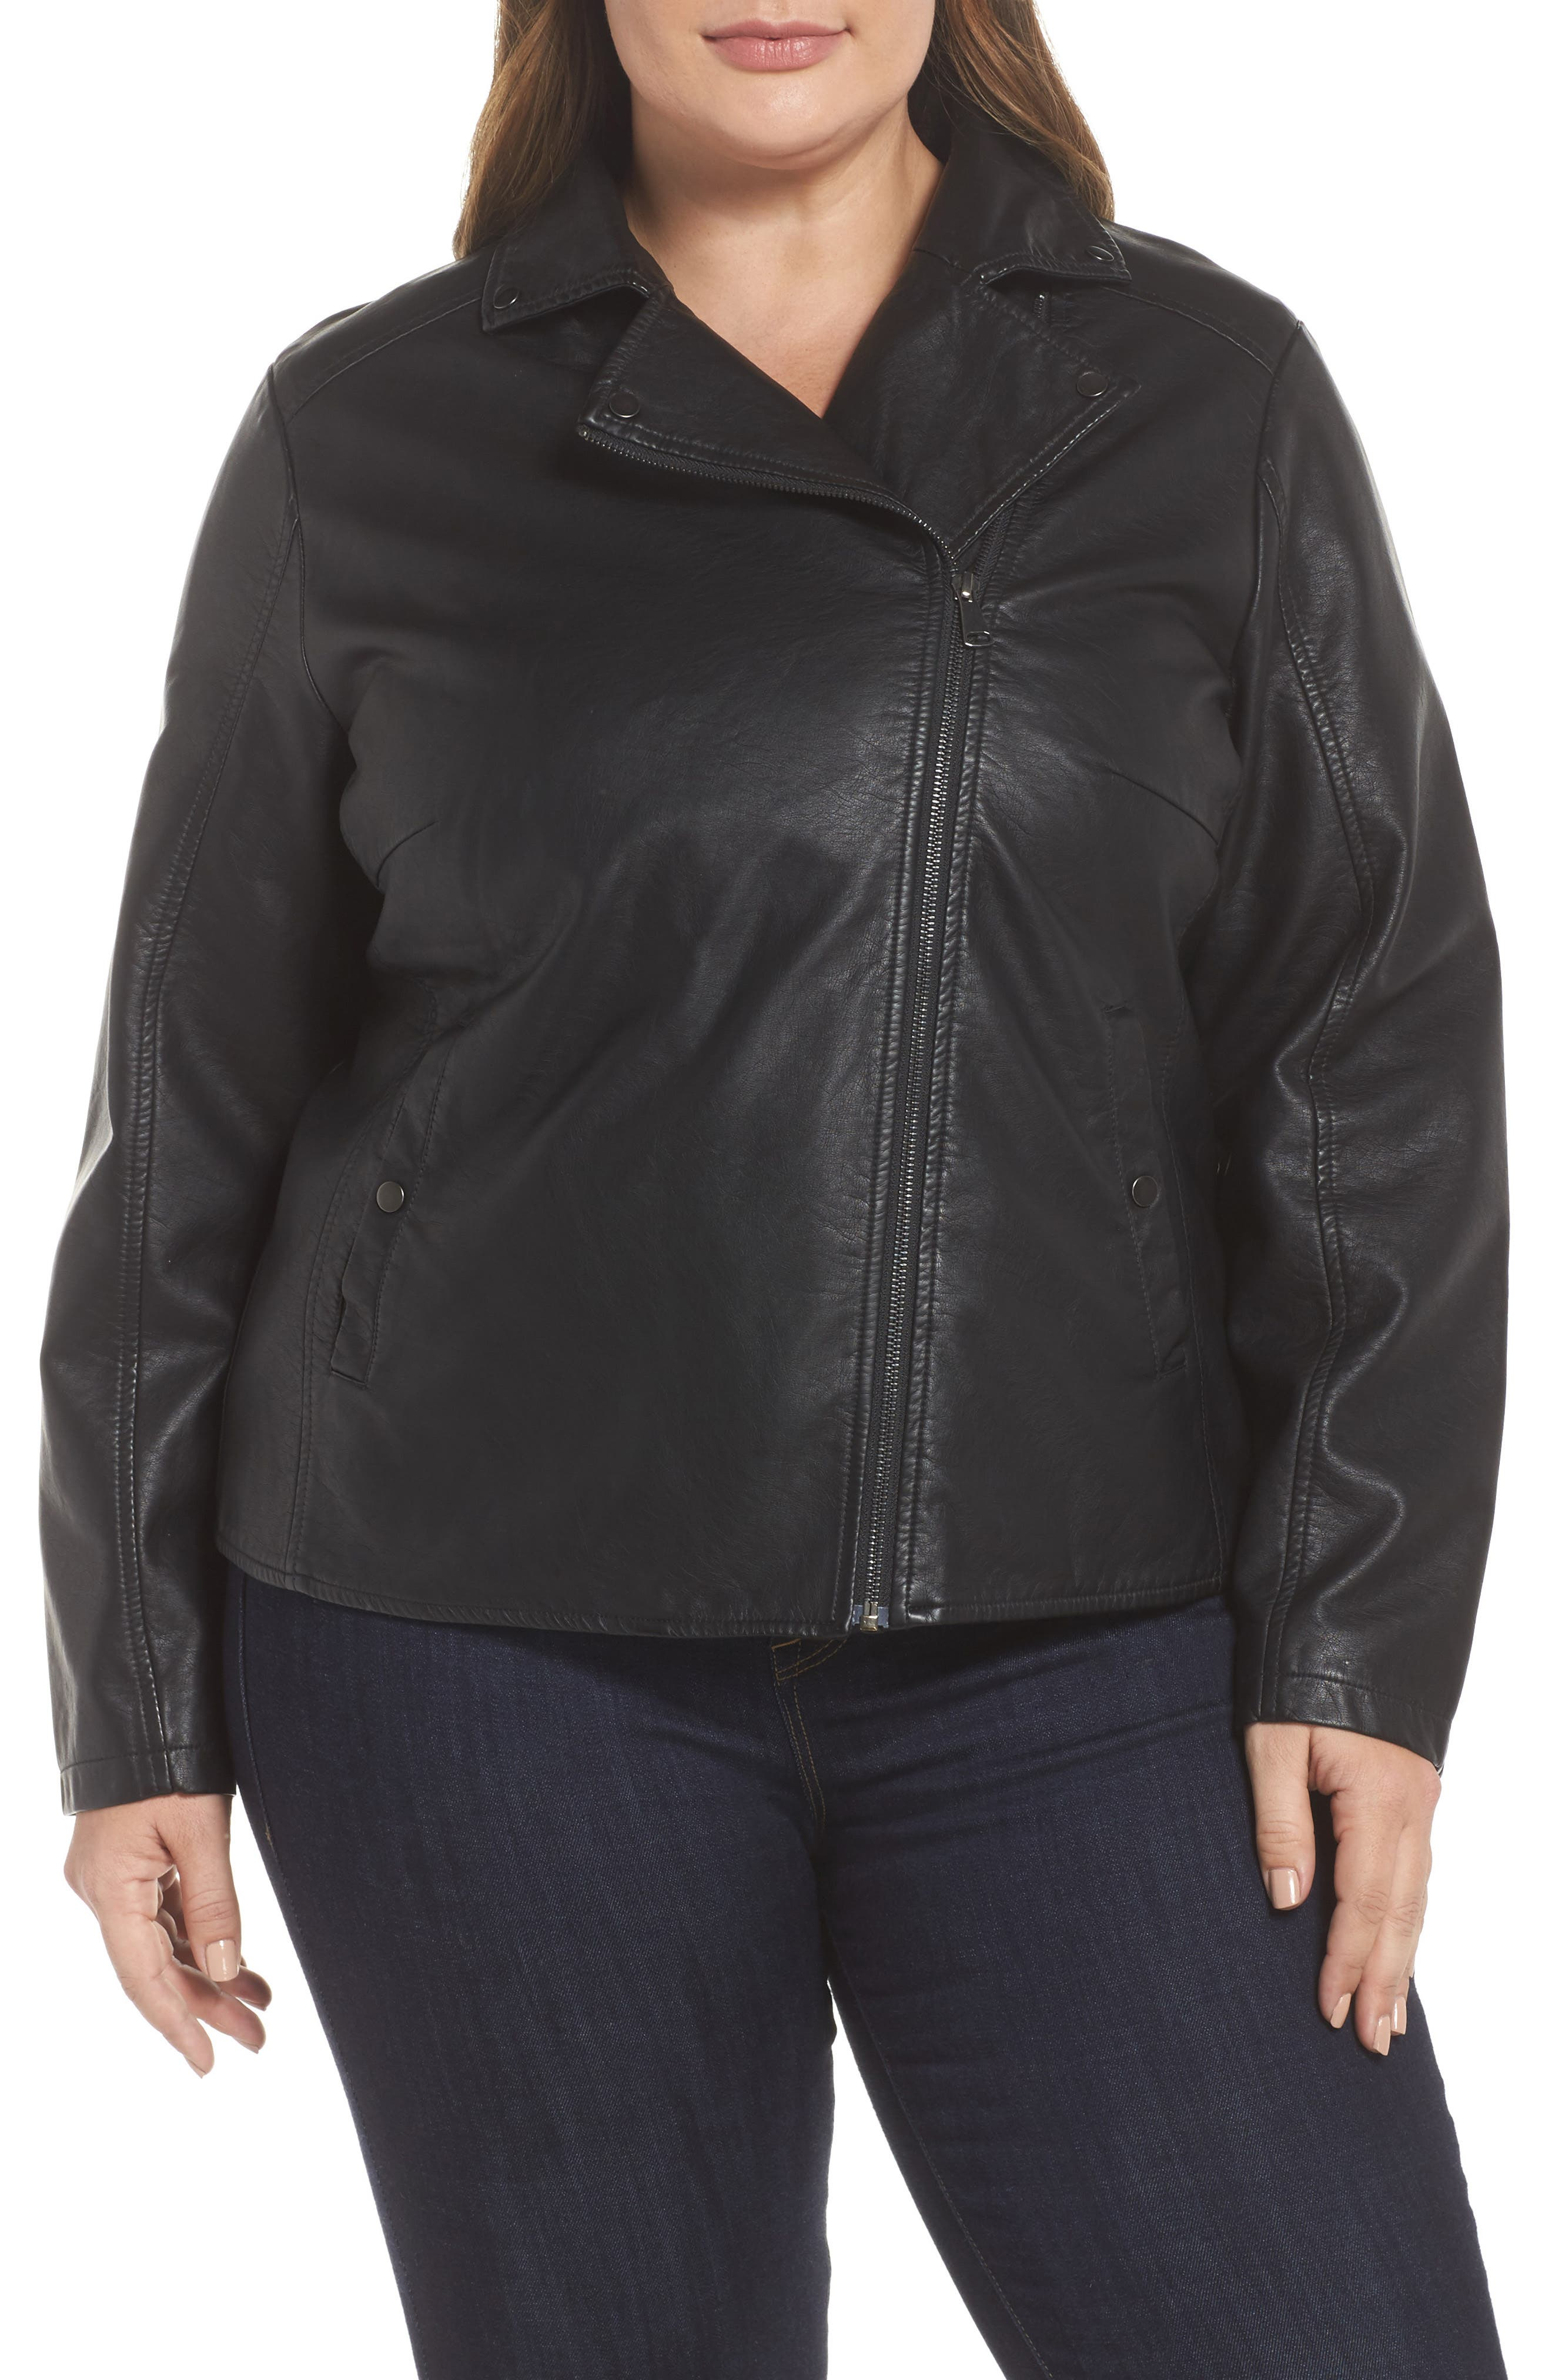 Karisa Faux Leather Moto Jacket,                             Alternate thumbnail 4, color,                             002